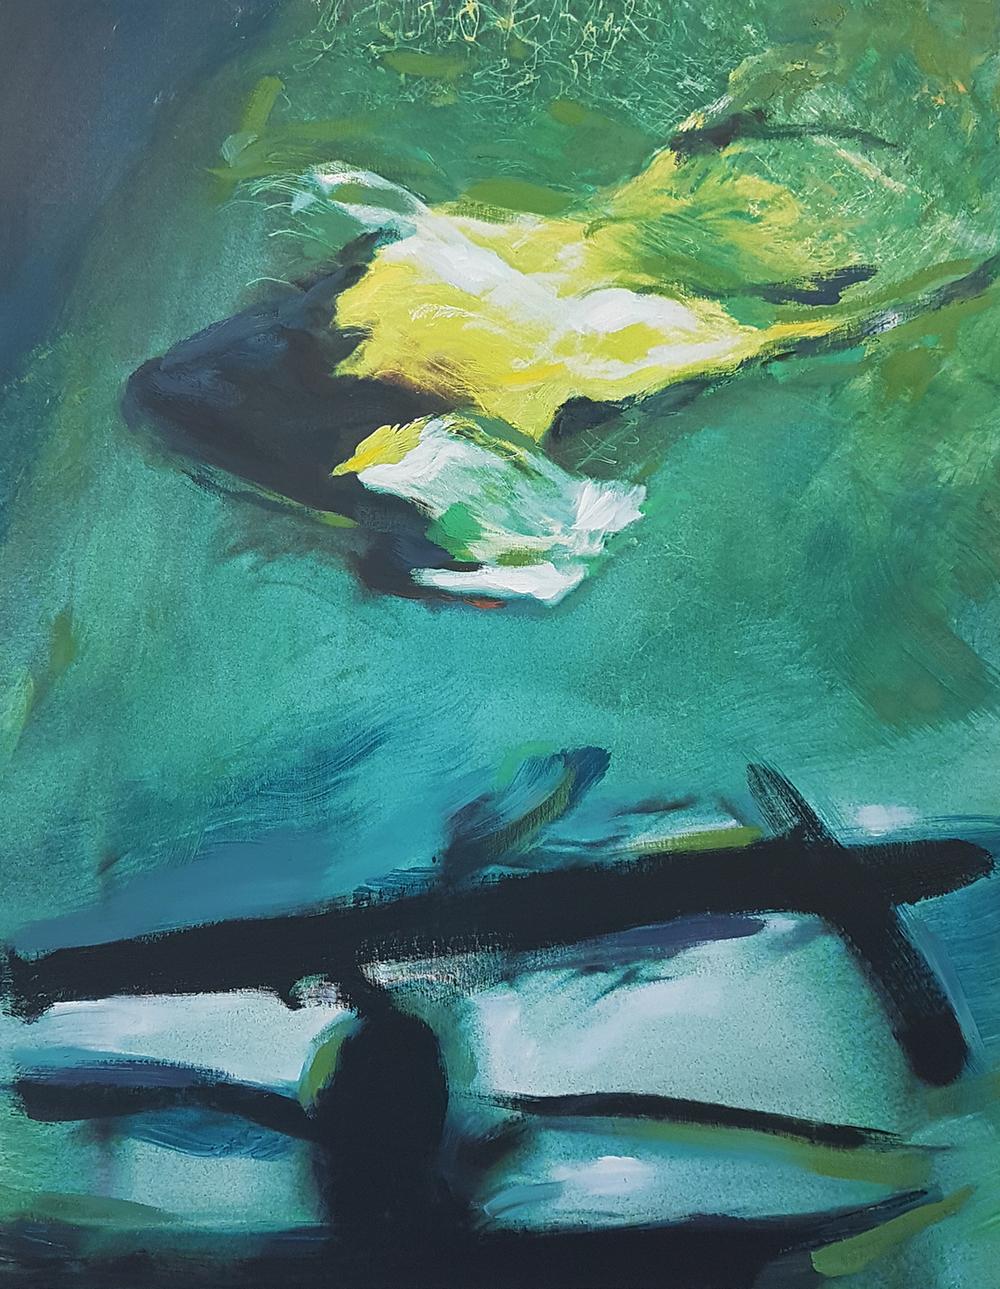 Andrew Hart Adler  Aqua Lady VIII  Mixed media and digital print on canvas  97 x 77 cm